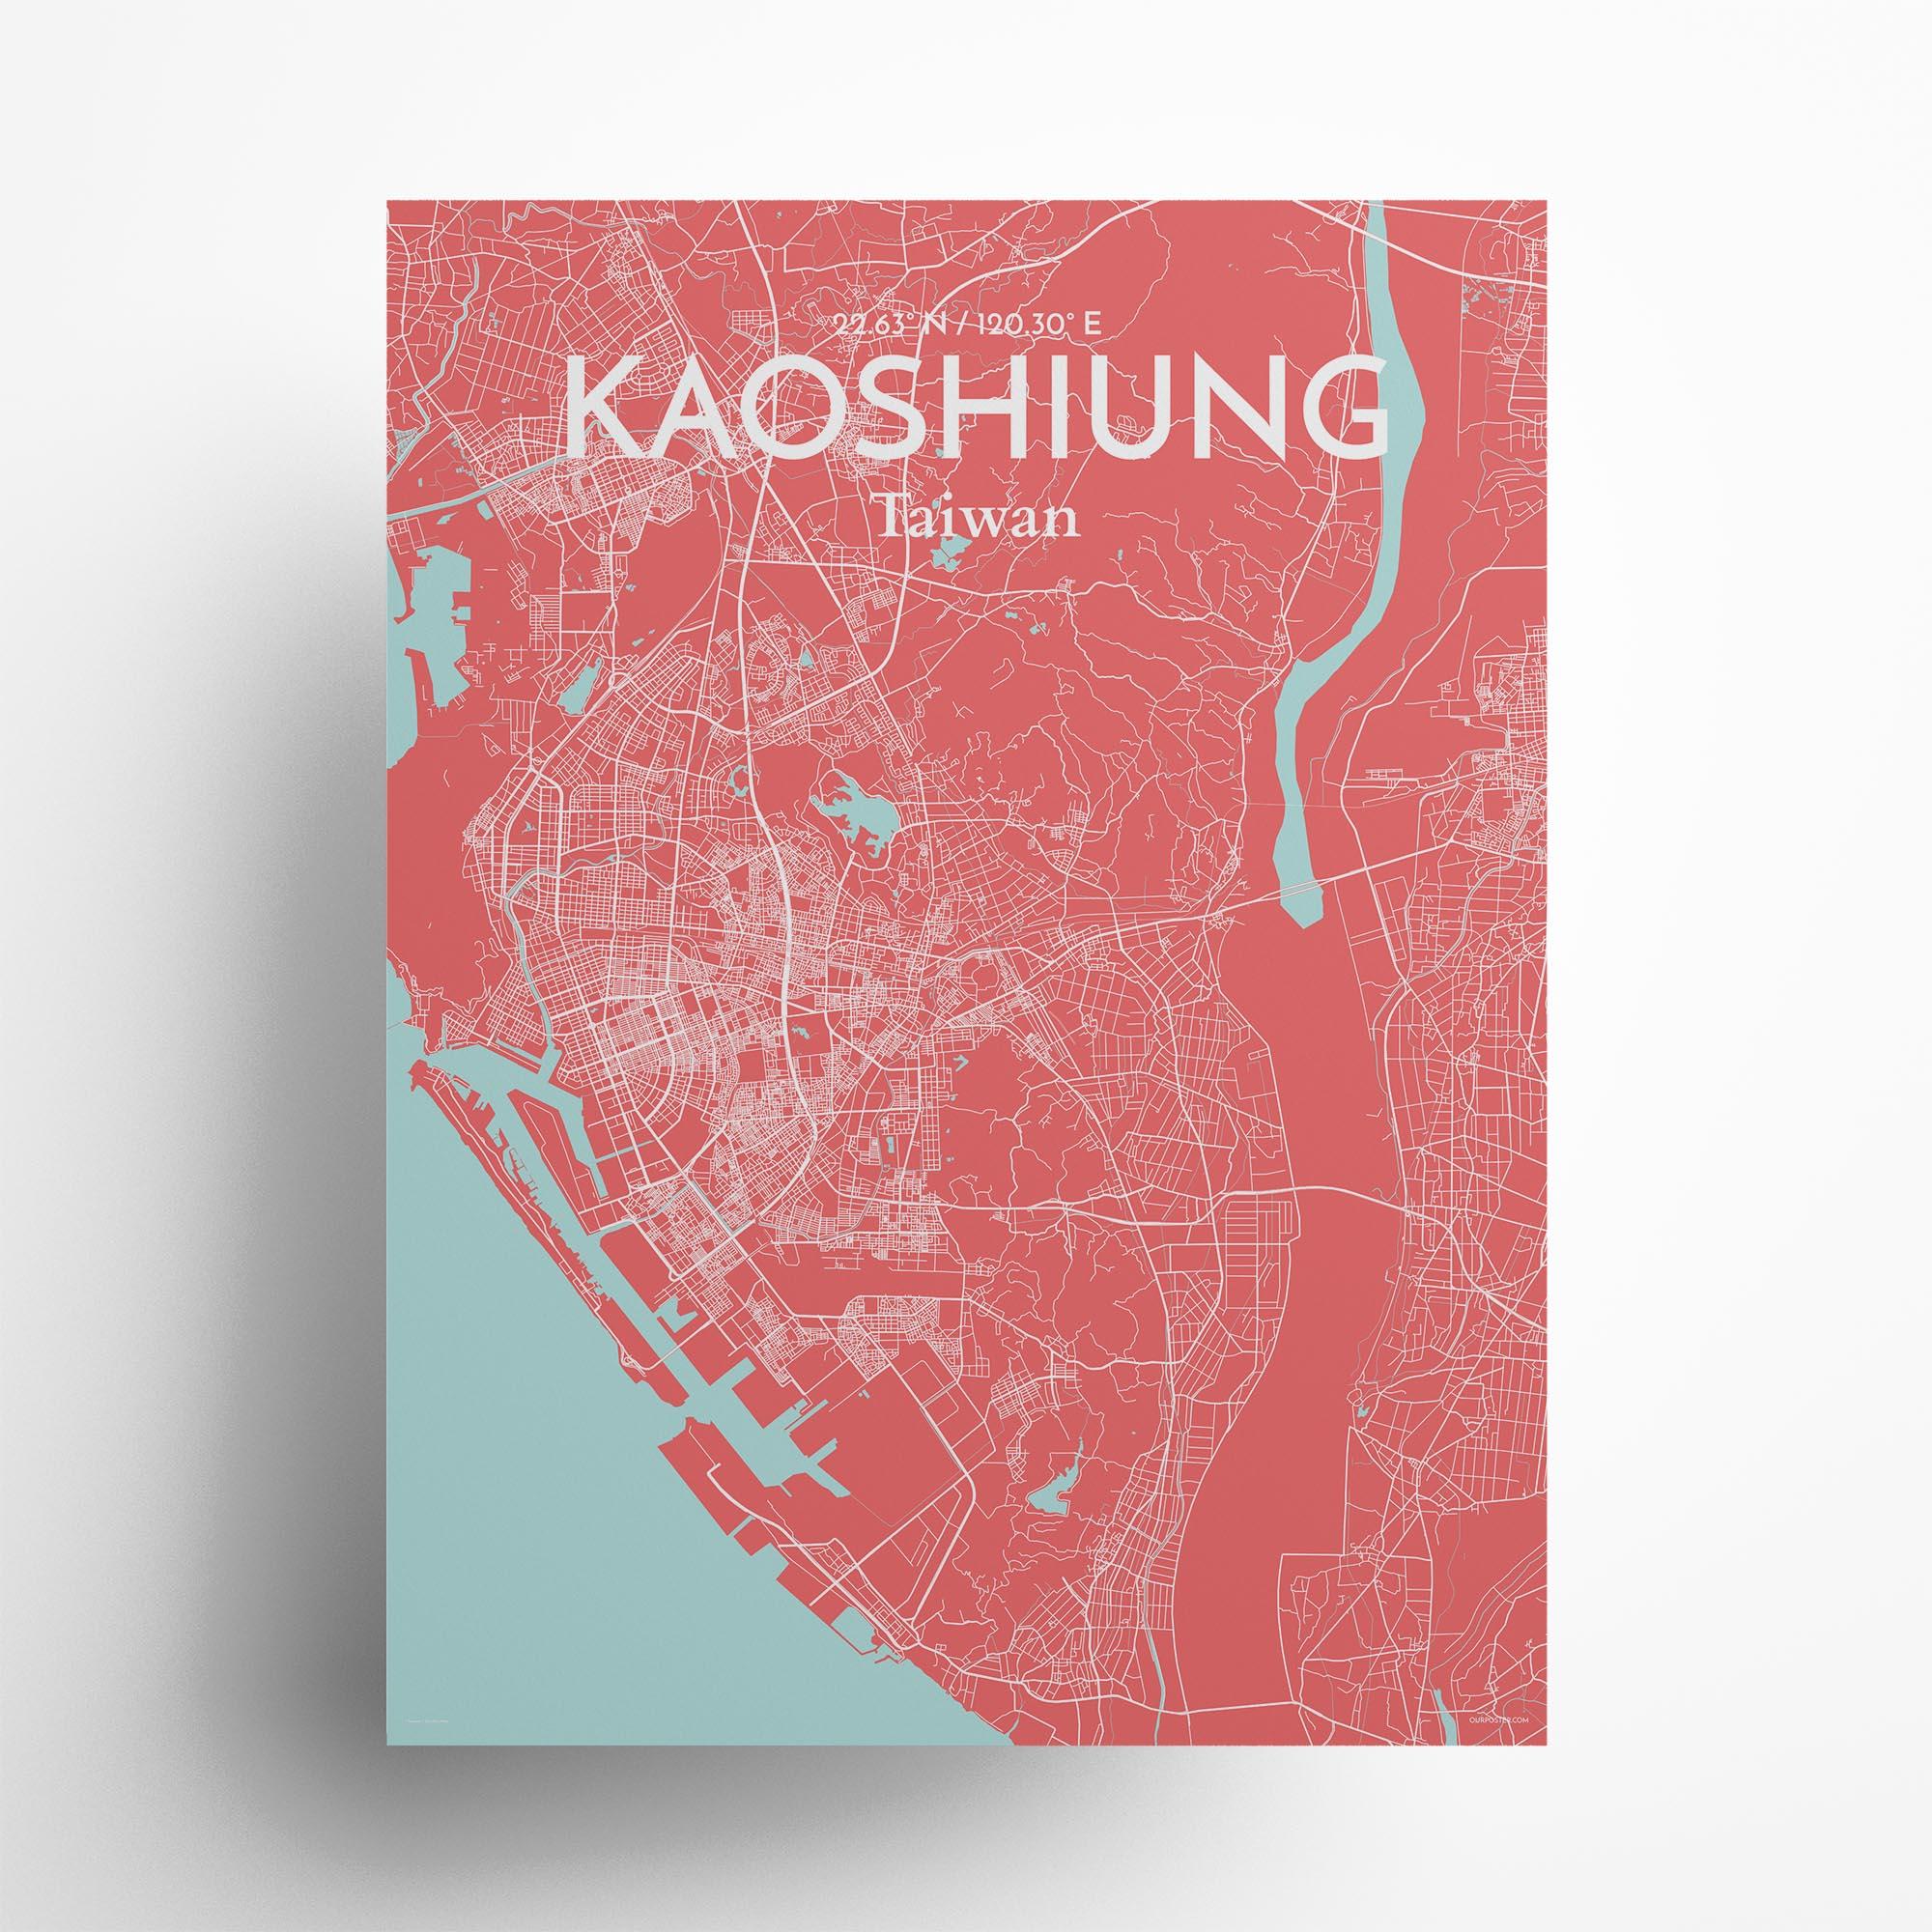 "Kaoshiung city map poster in Maritime of size 18"" x 24"""